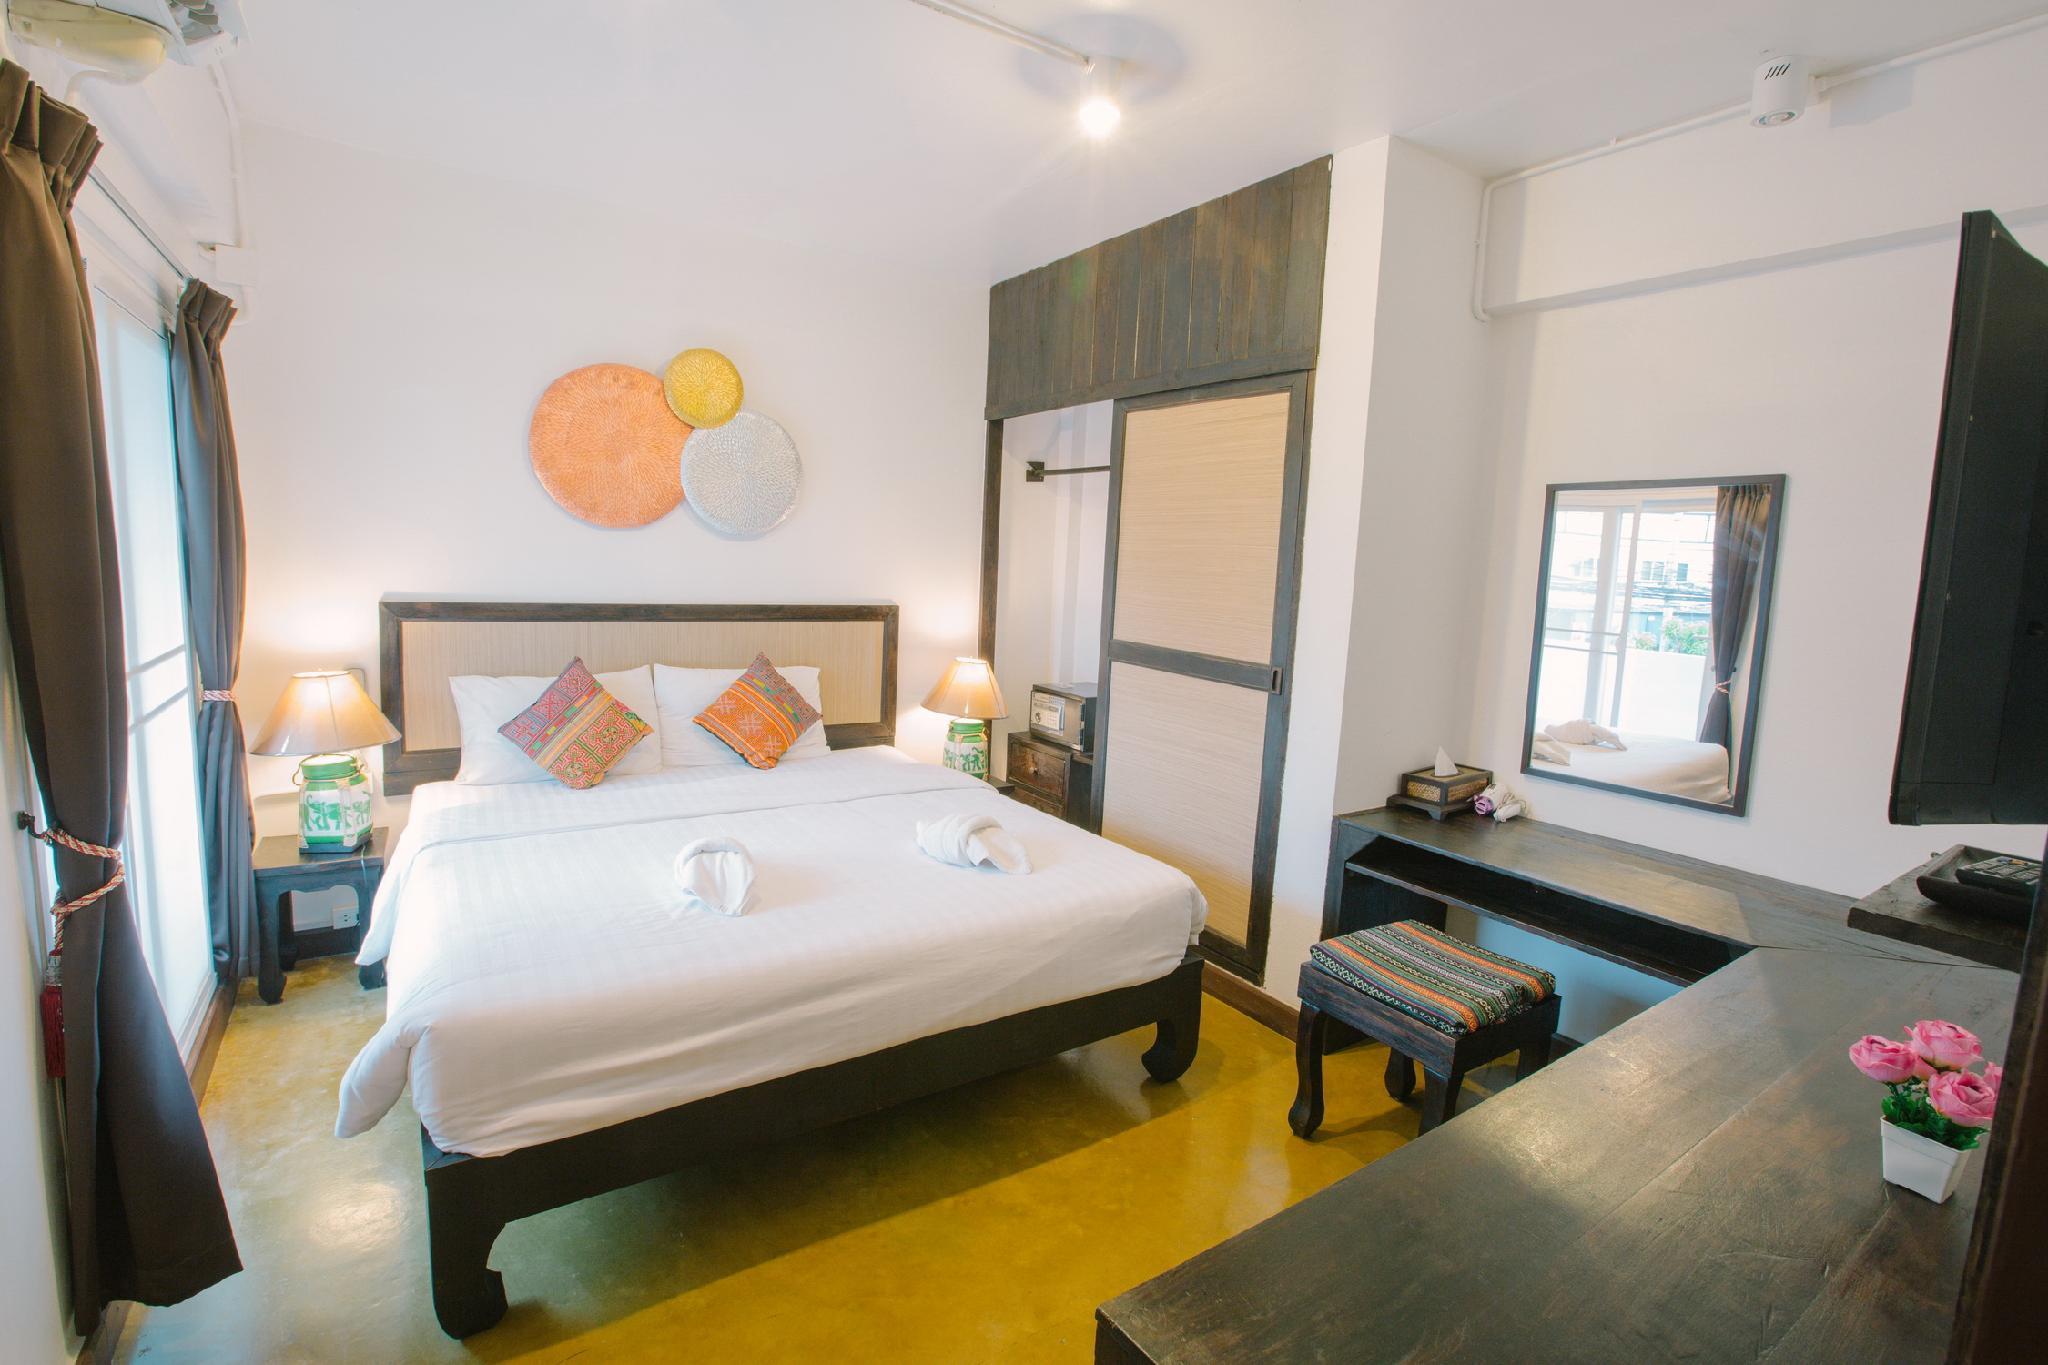 The Odyssey Chiang Mai Hotel โรงแรมดิ โอดิสซีย์ เชียงใหม่